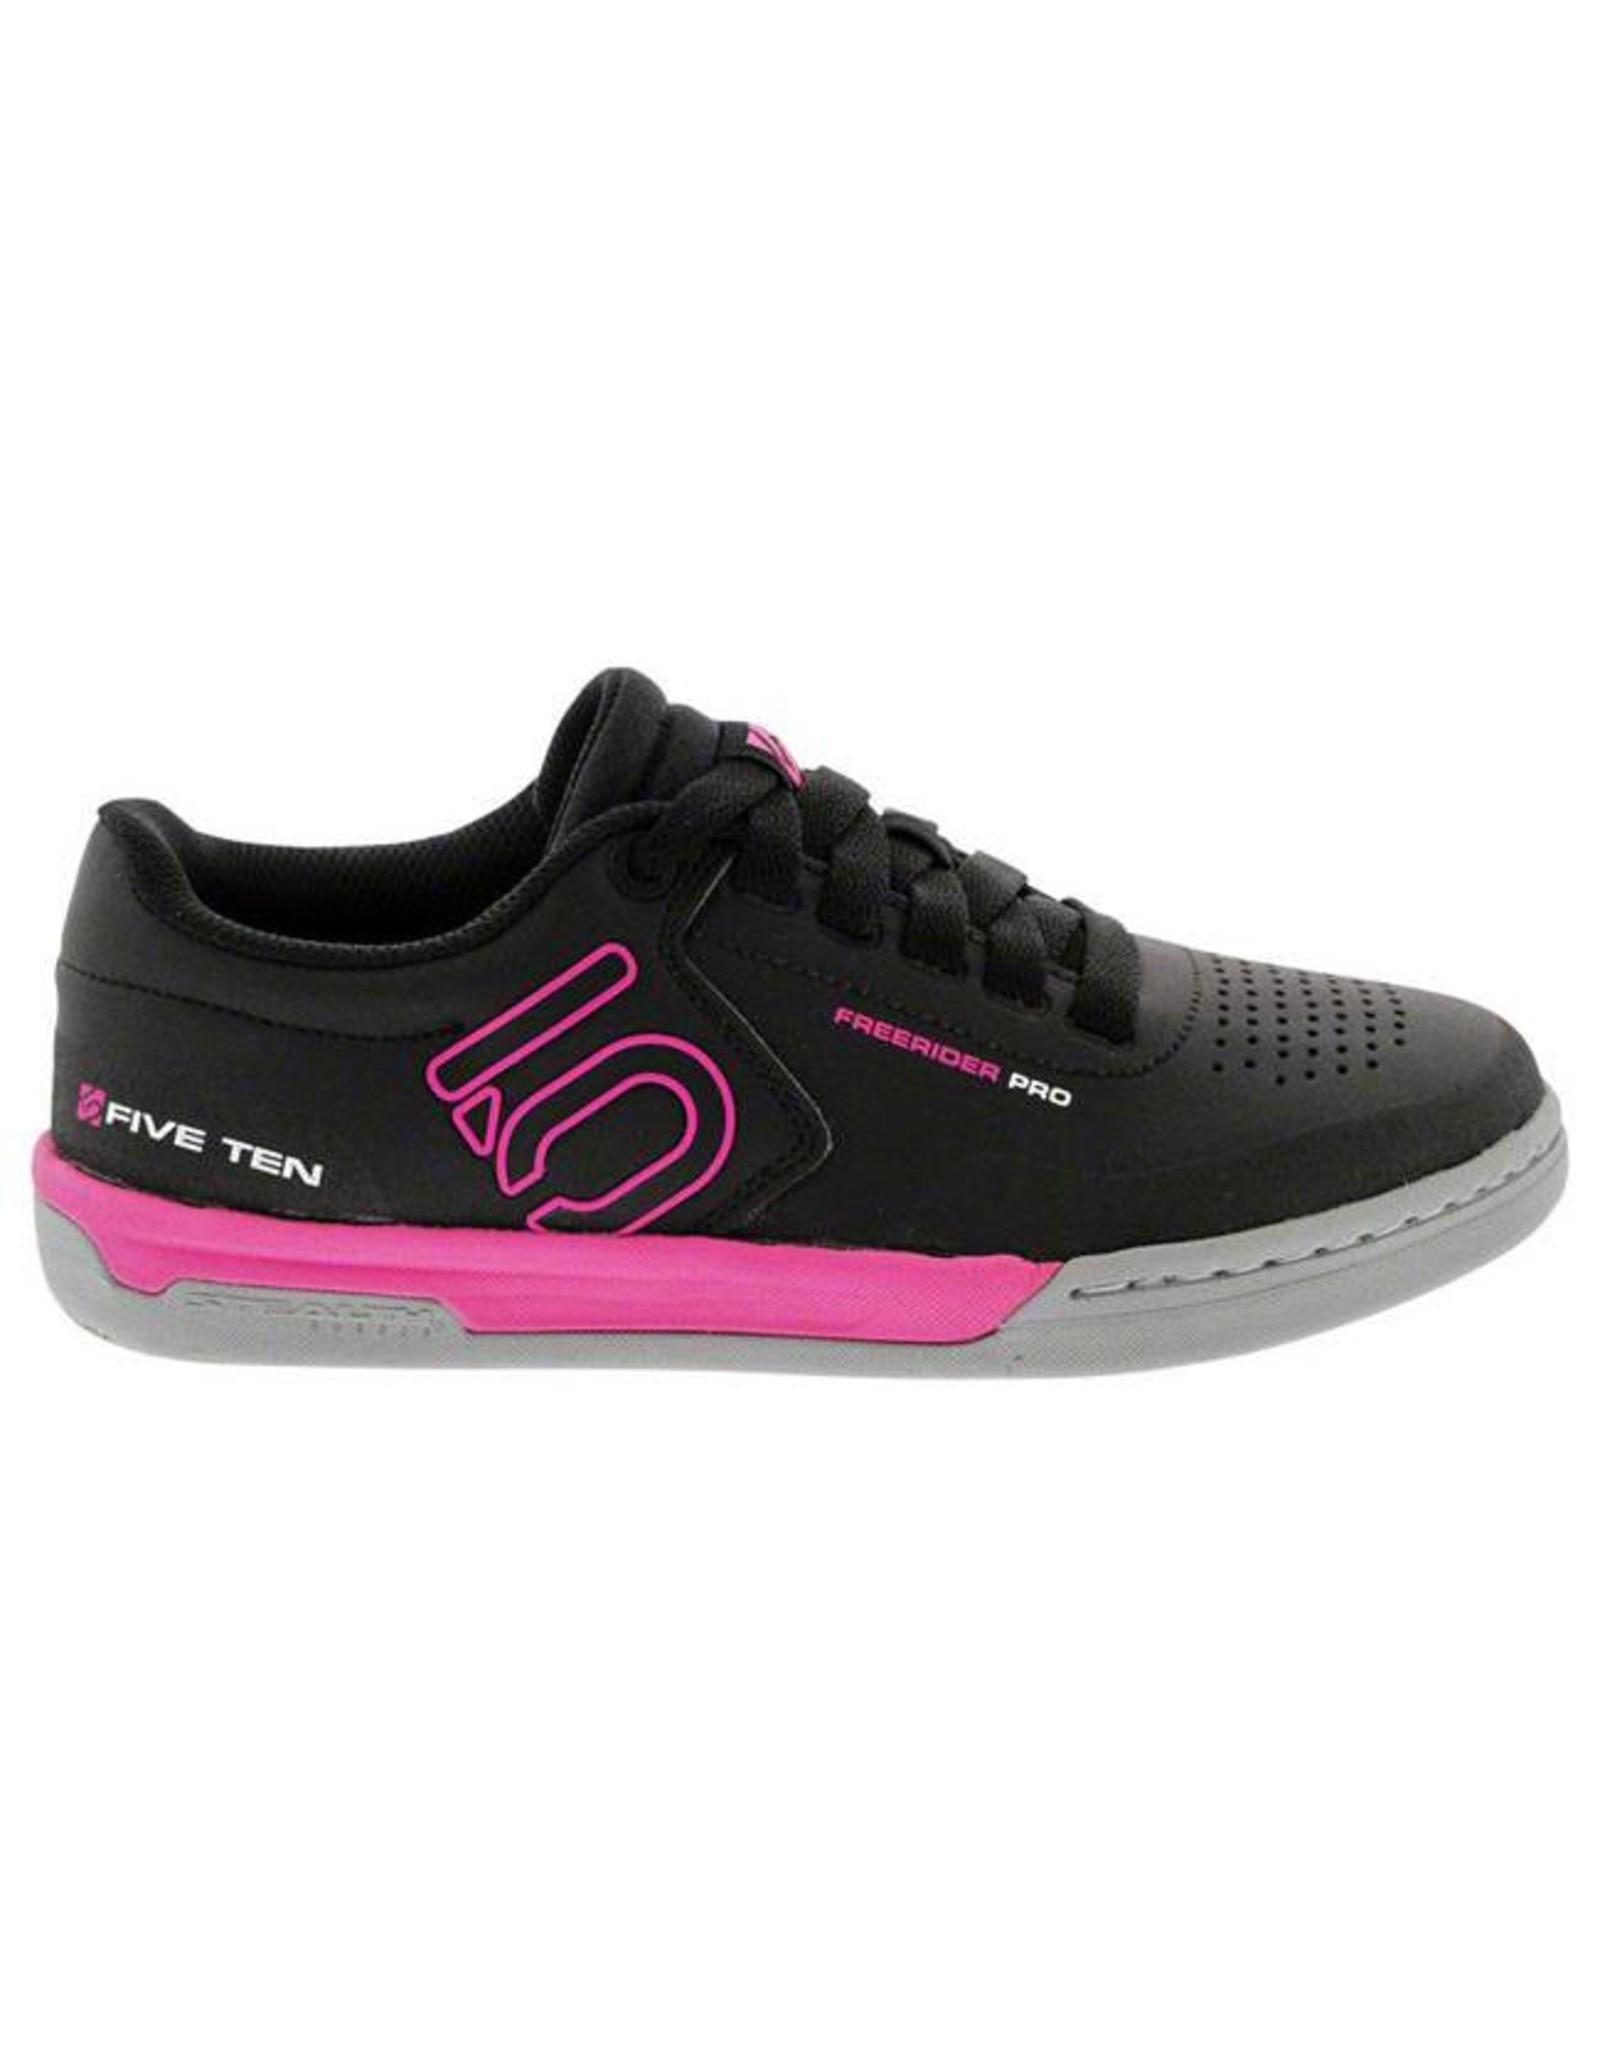 Five Ten Five Ten Freerider Pro Women's Flat Pedal Shoe: Black/Pink 8